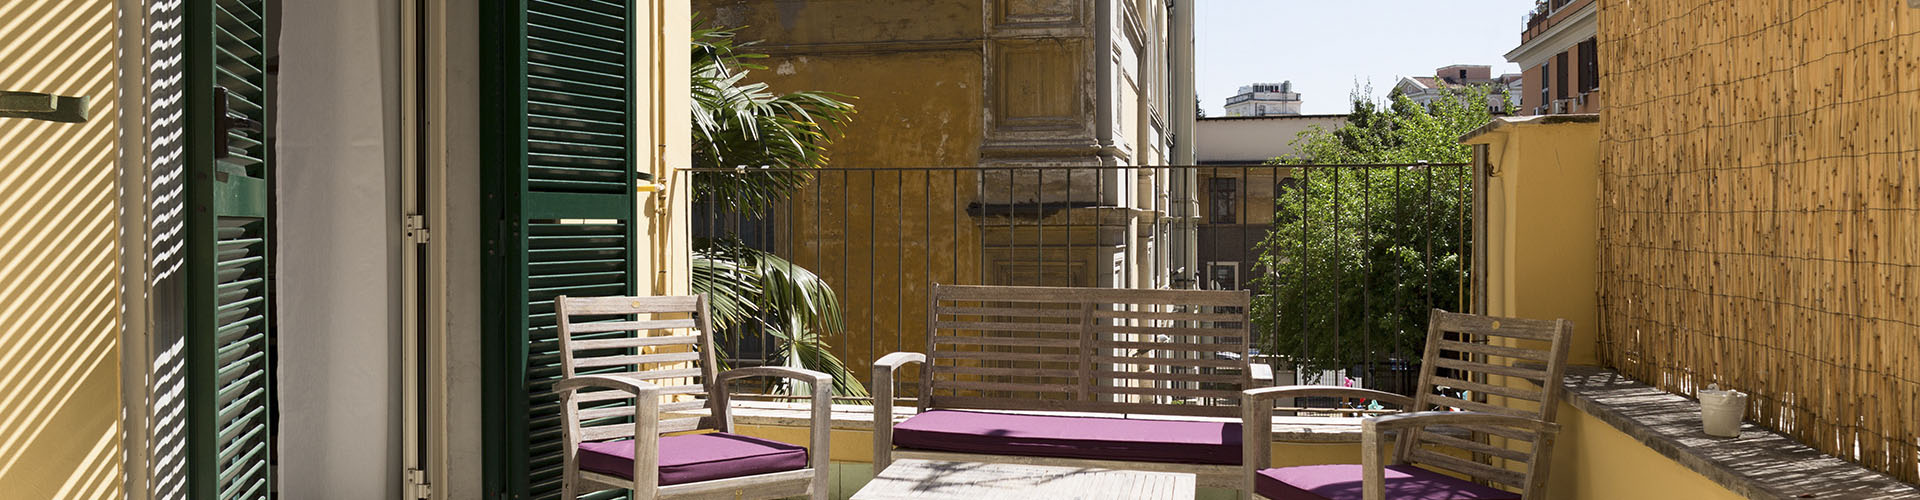 Home Inn Rome - Balcony